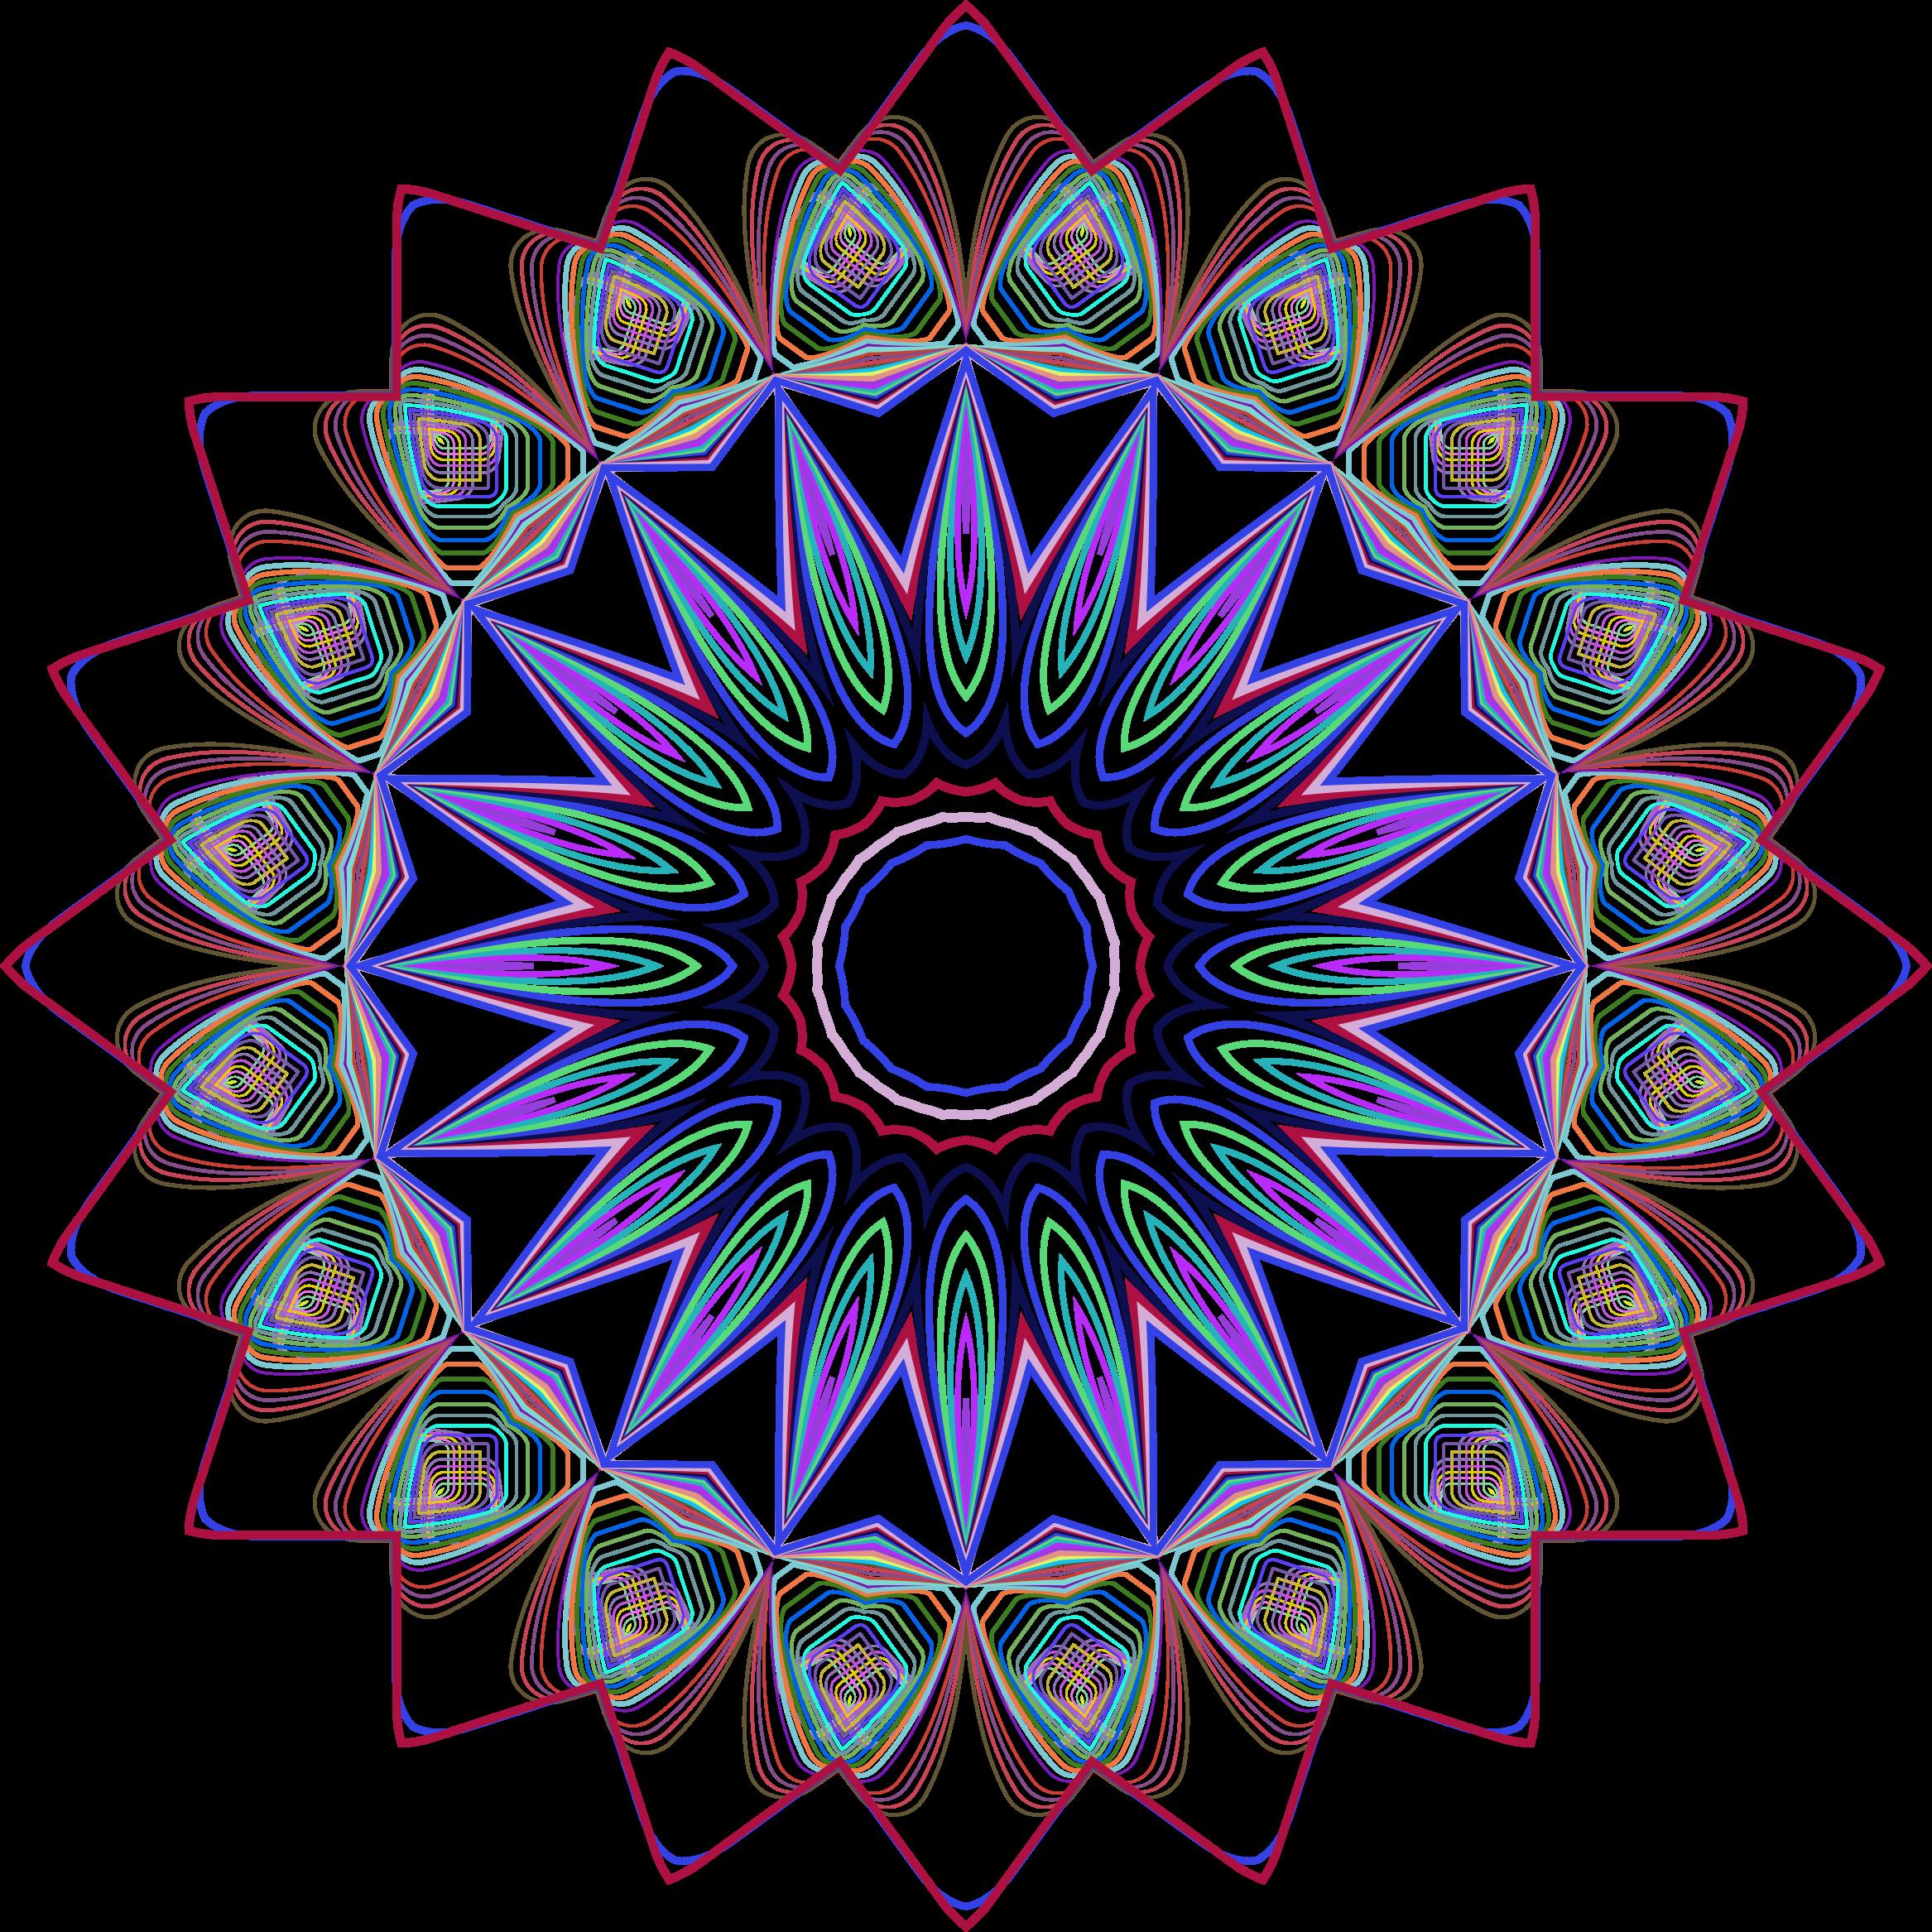 Line Art Mandala : Mandalas on emaze